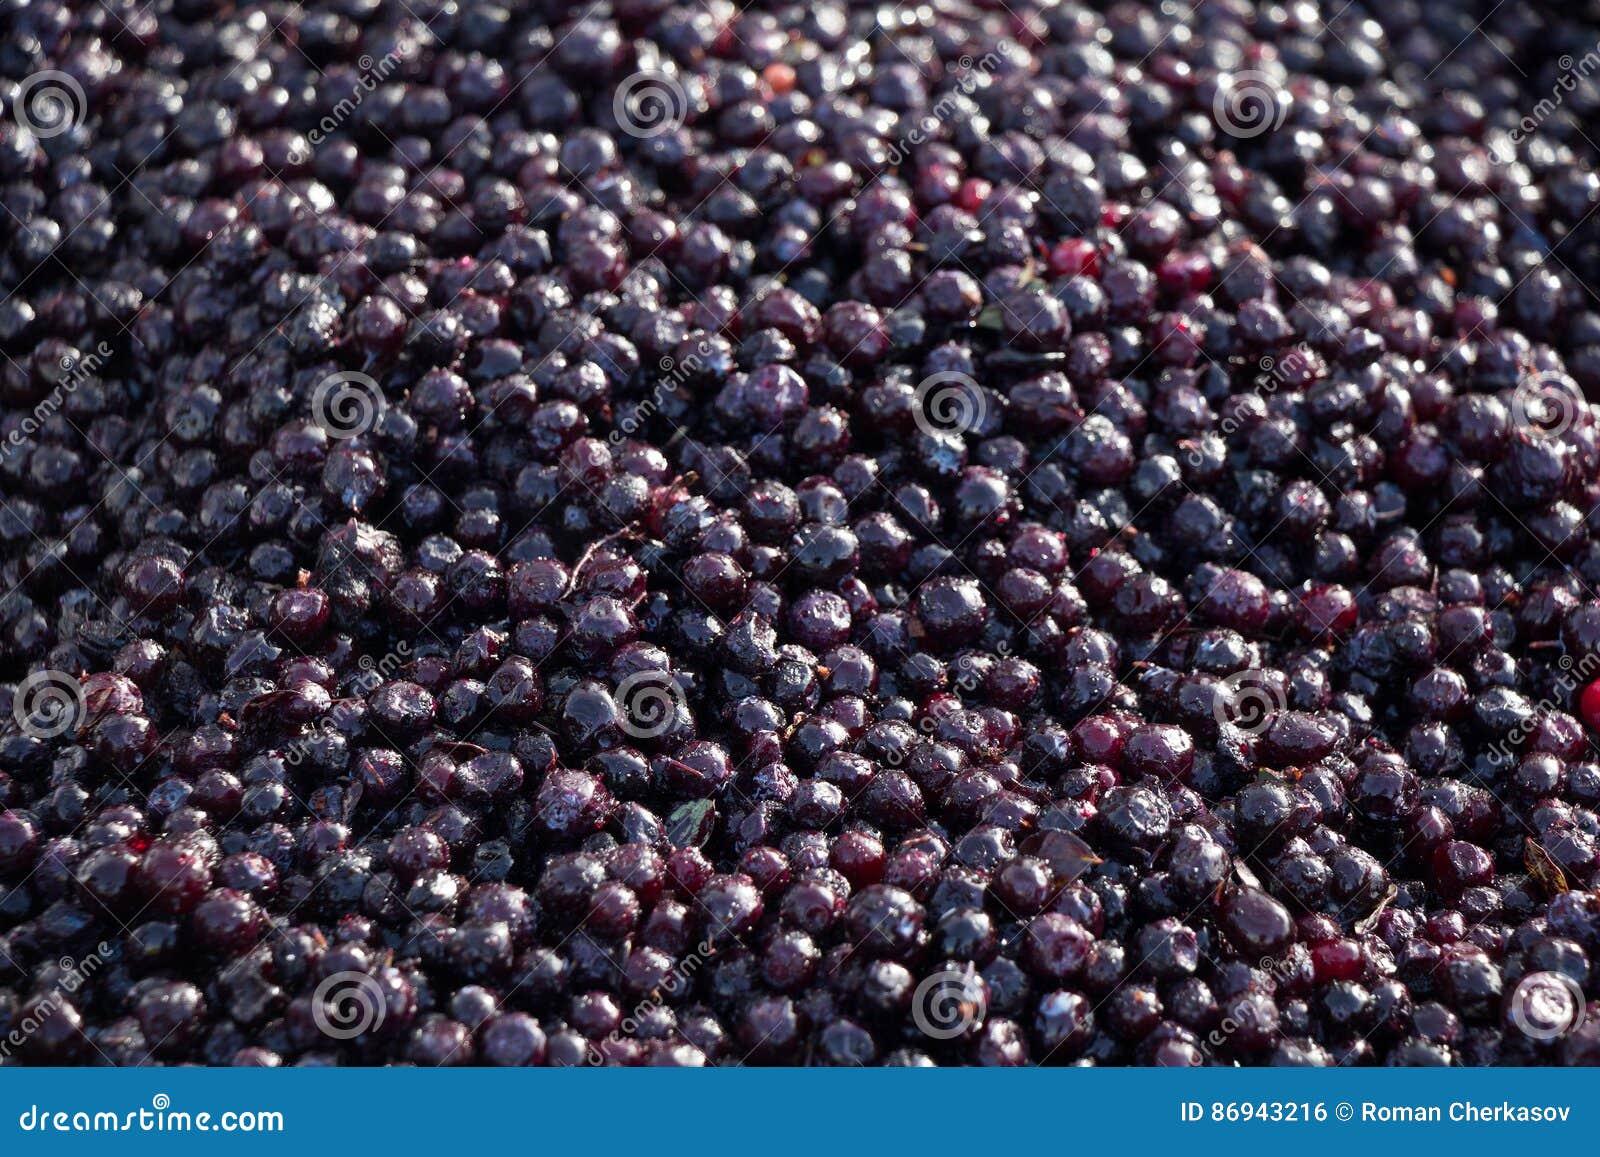 Blueberries. fresh berry